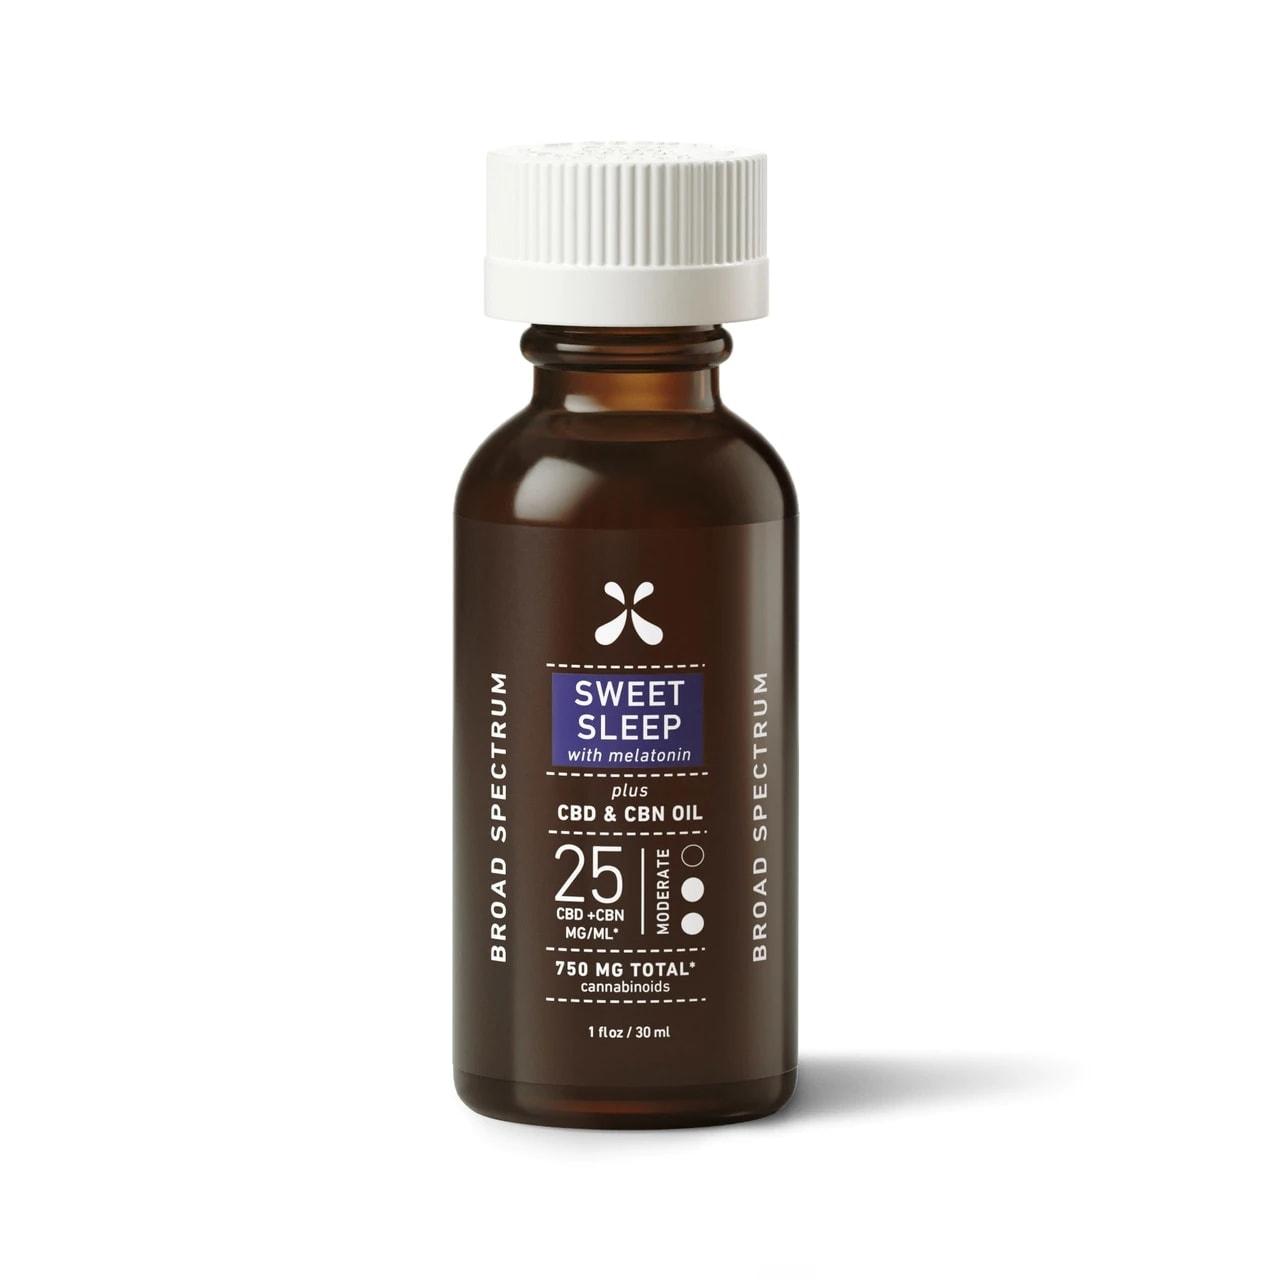 Green Roads, Sweet Sleep CBD+CBN Oil, Broad Spectrum THC-Free, 1oz, 25MG:ML, 750mg of CBD2